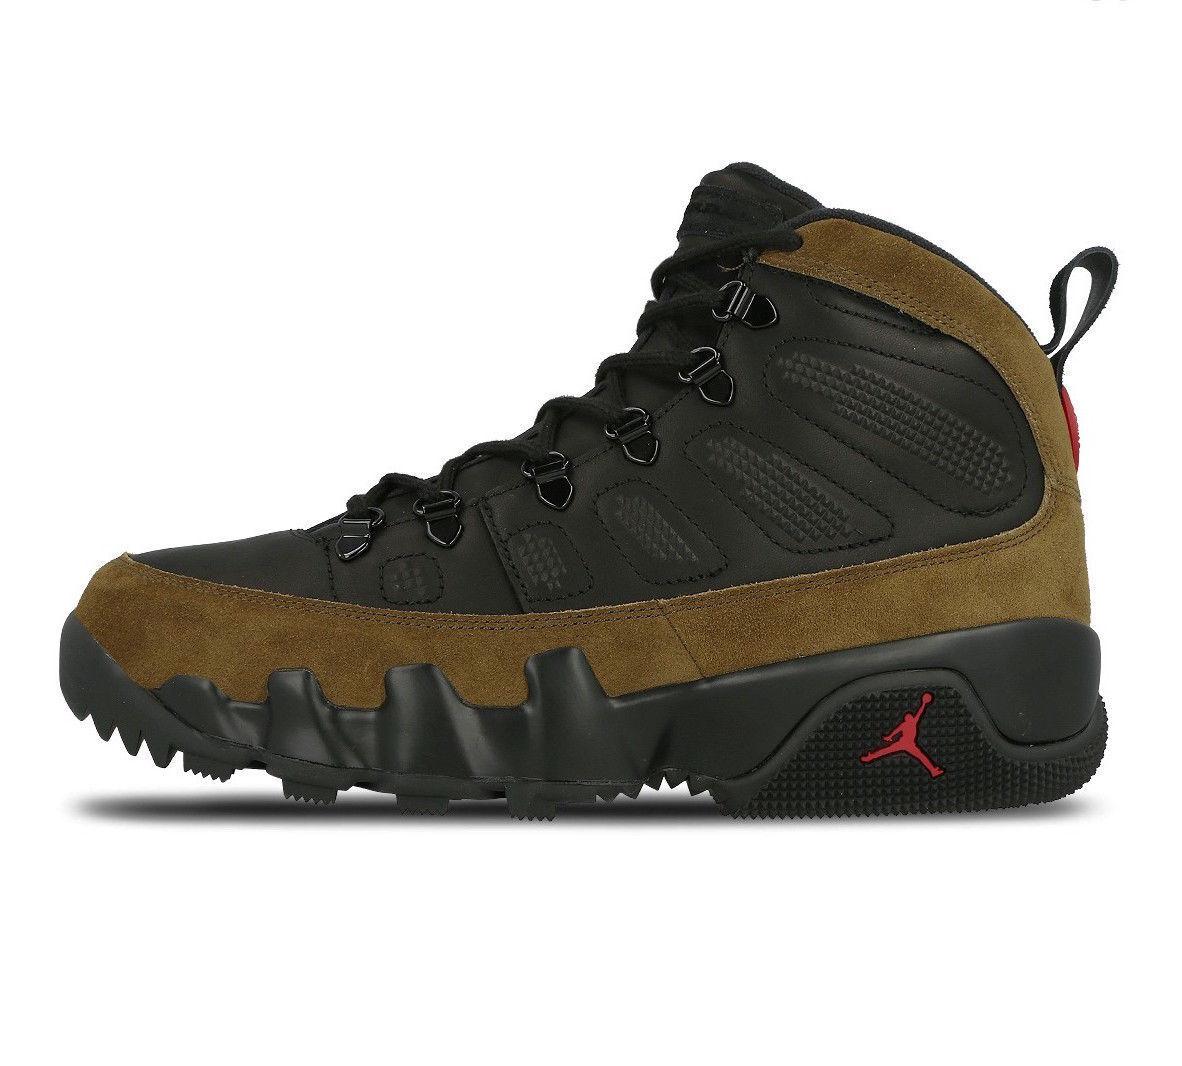 Aria nuova jordan jordan nuova 9 ix retrò boot nrg luce oliva nera vero red 8 ar4491 012 9f61ce